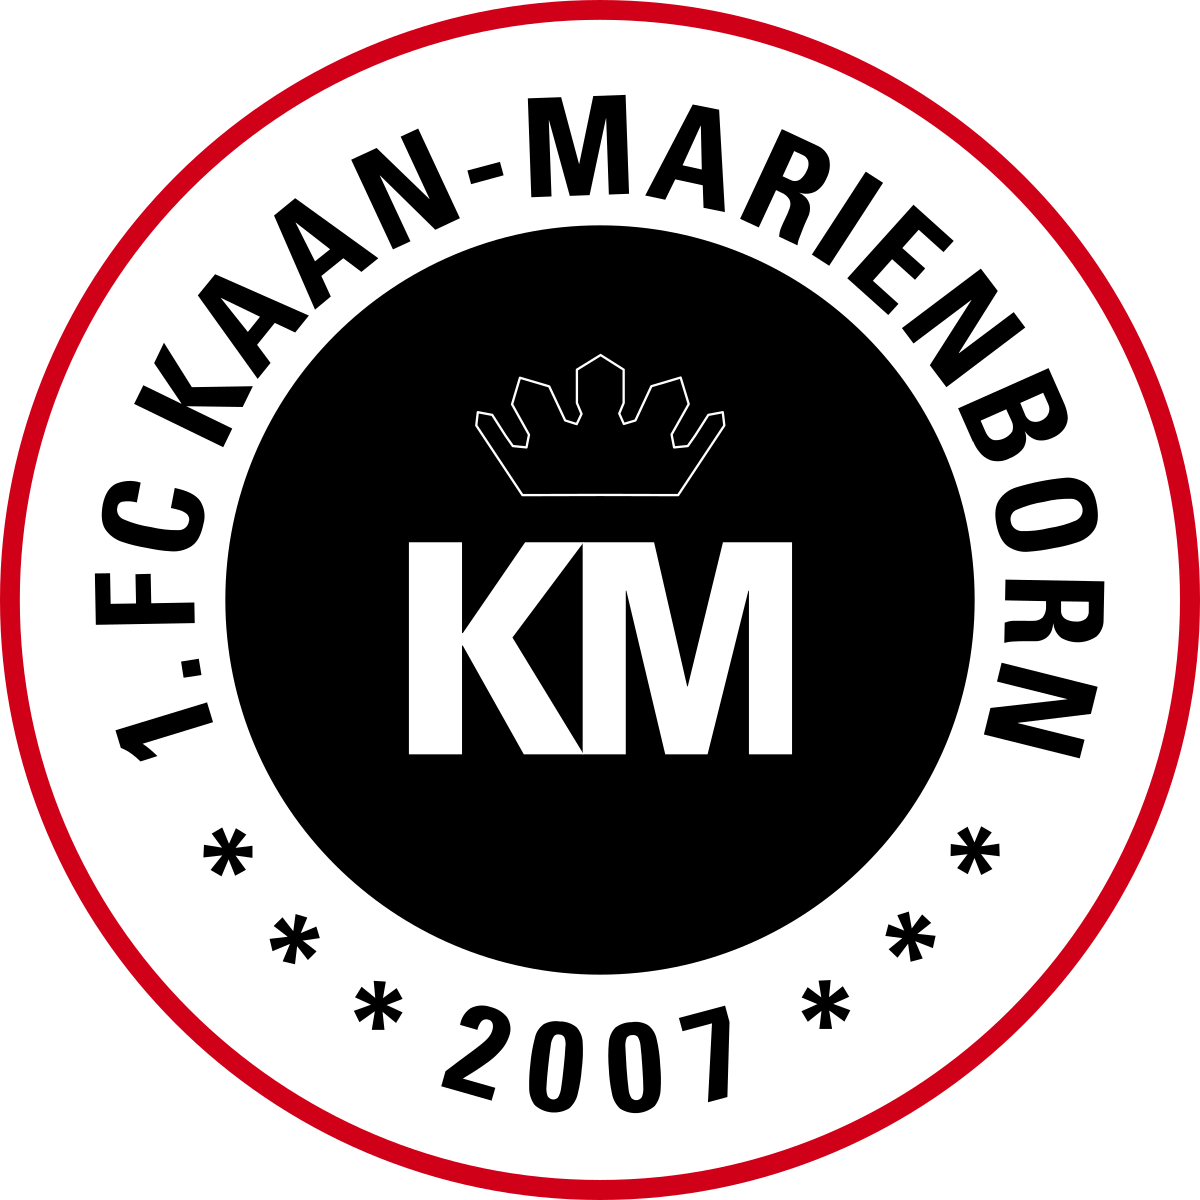 Kaan-Marienborn logo